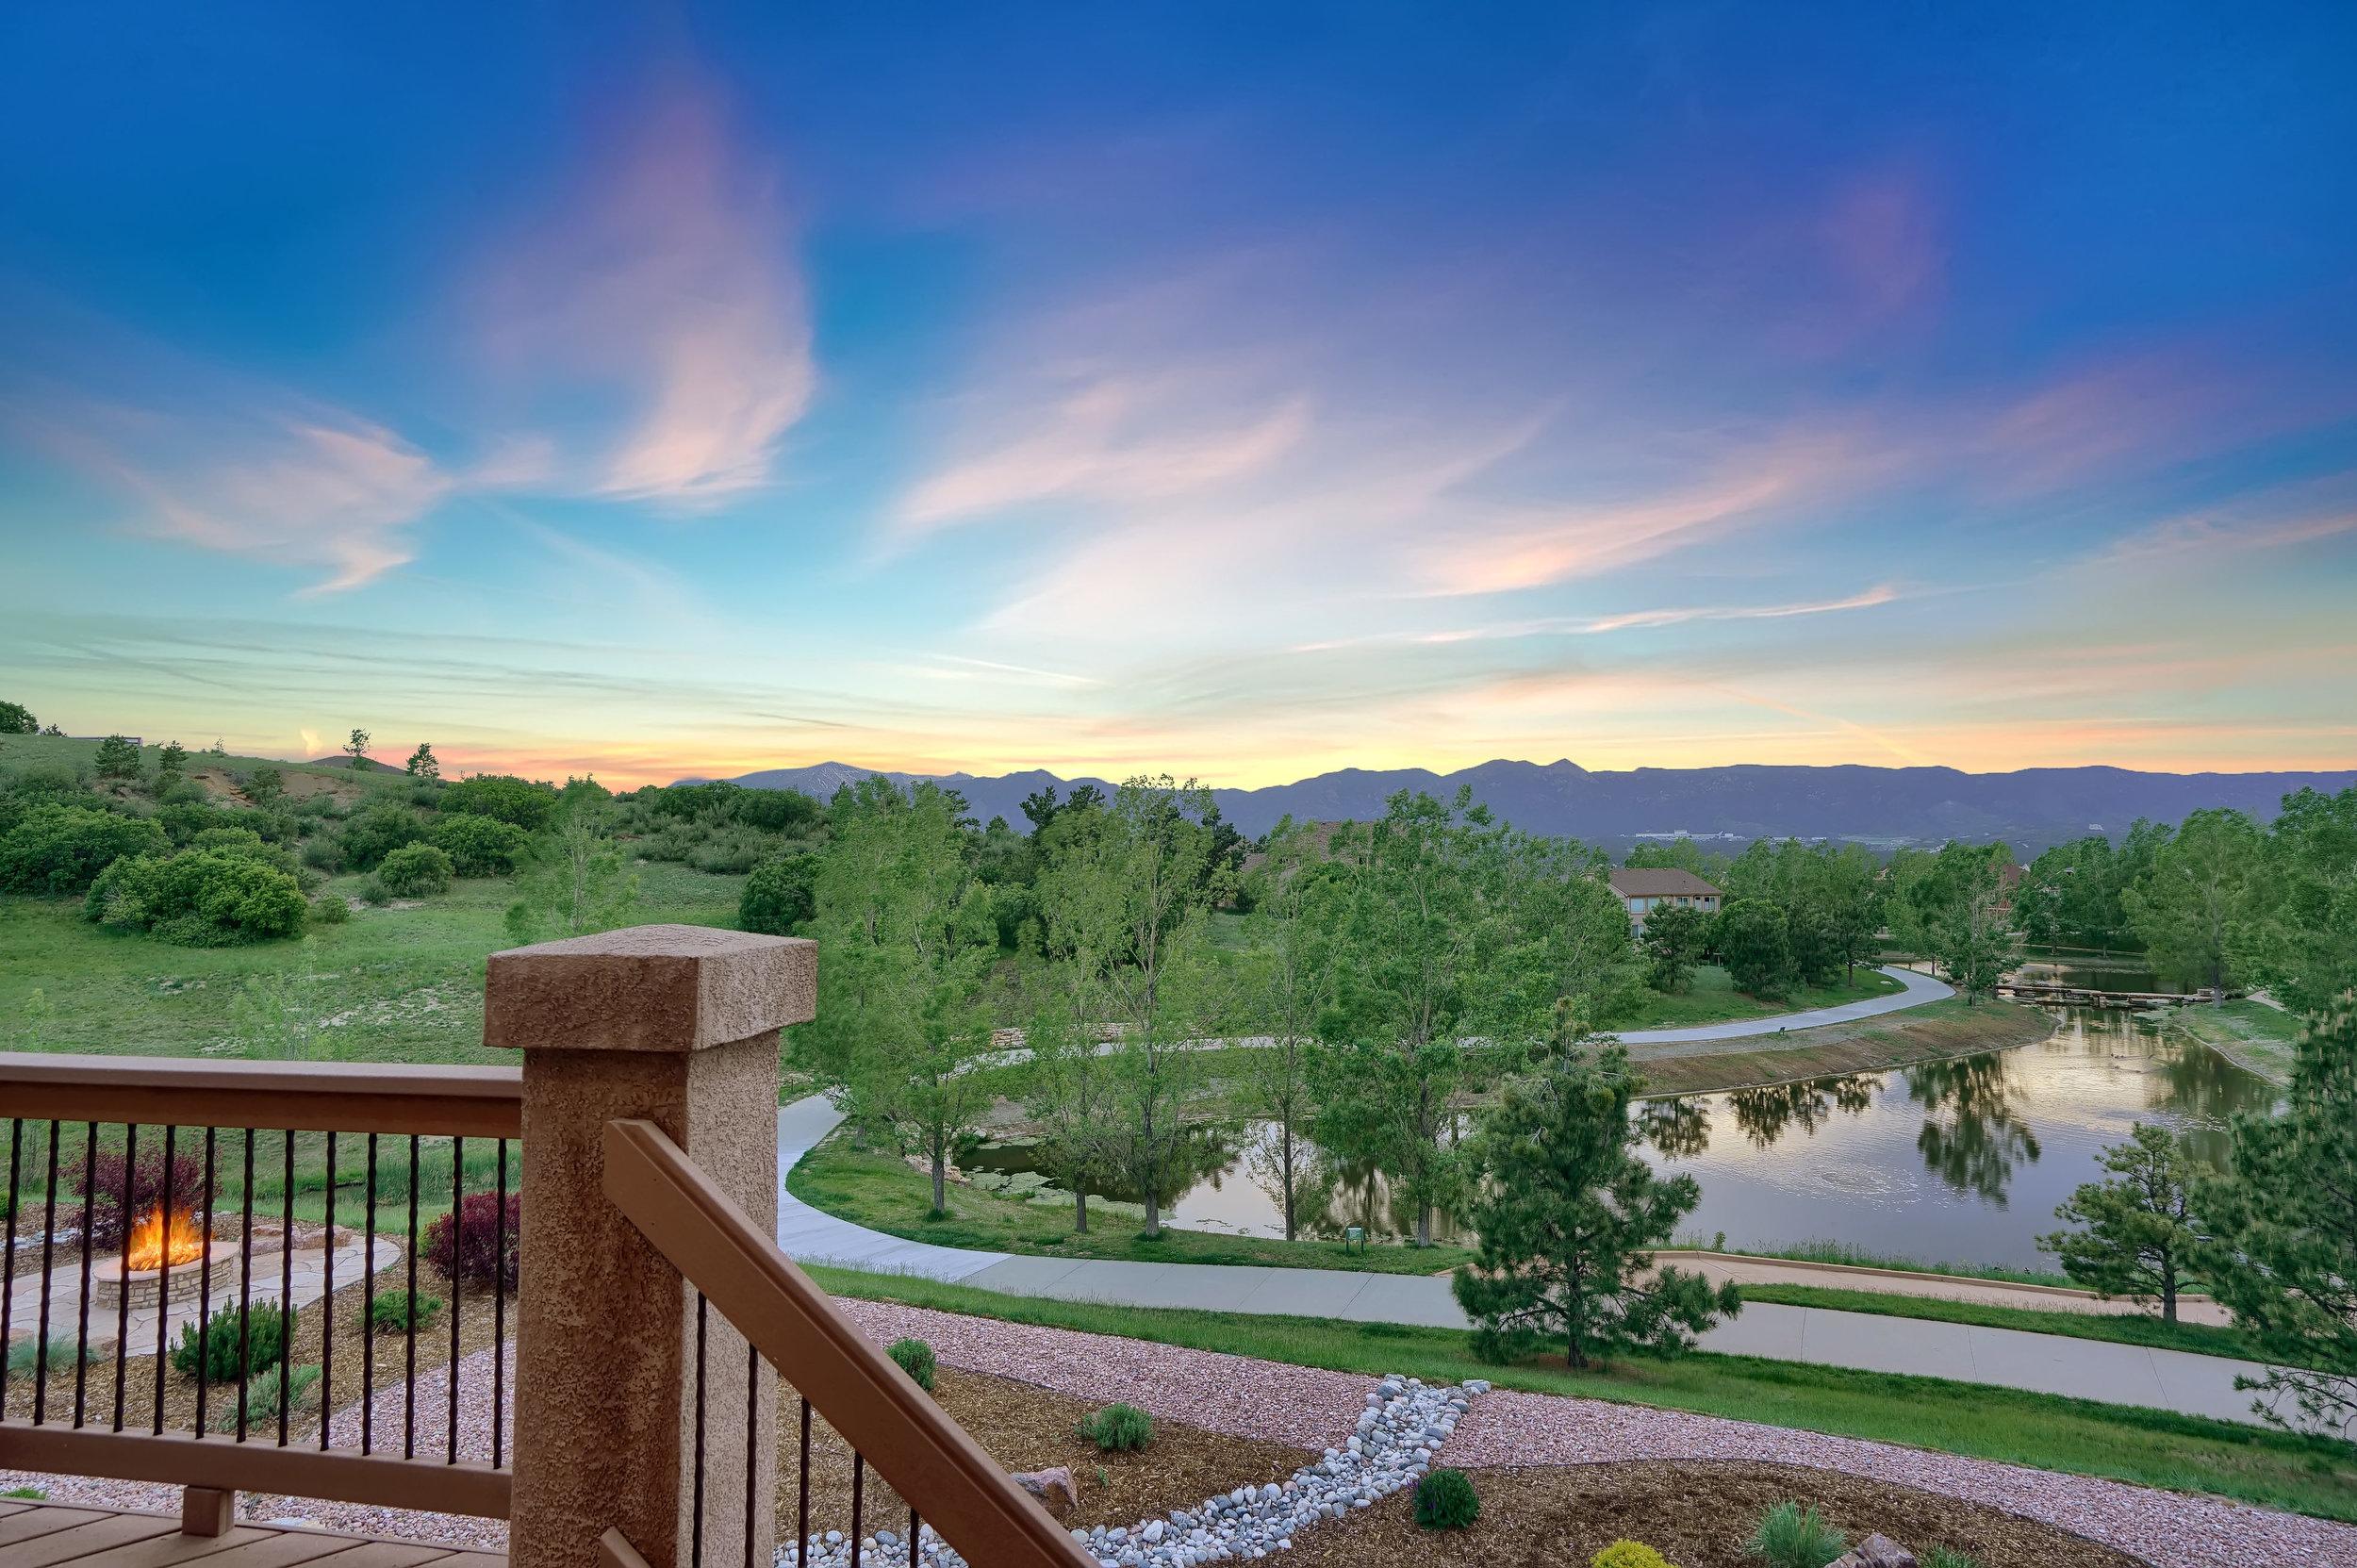 12496 Creekhurst Dr Colorado-print-006-001-View-3934x2617-300dpi.jpg